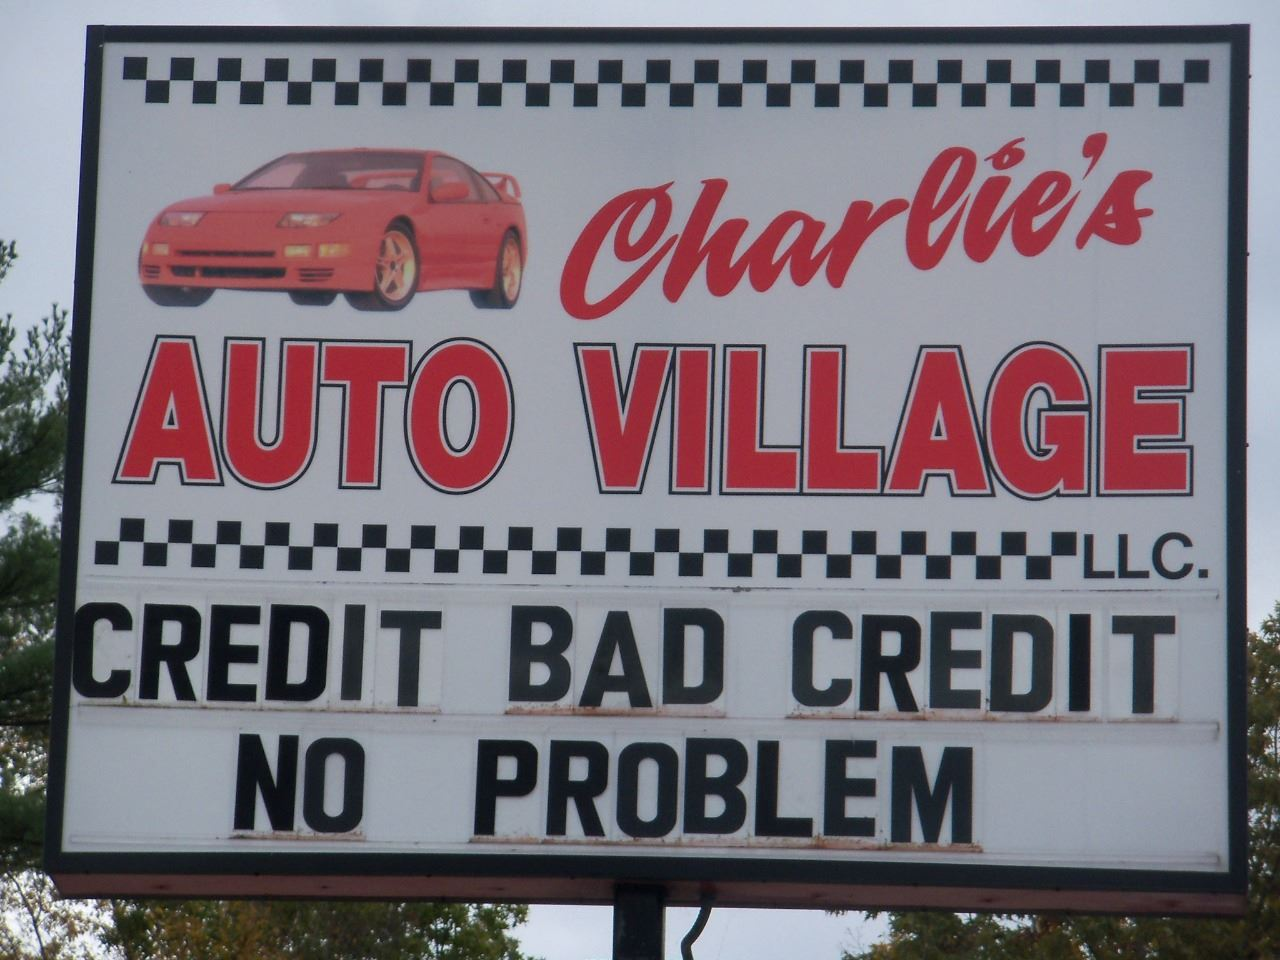 Charlies Auto Village